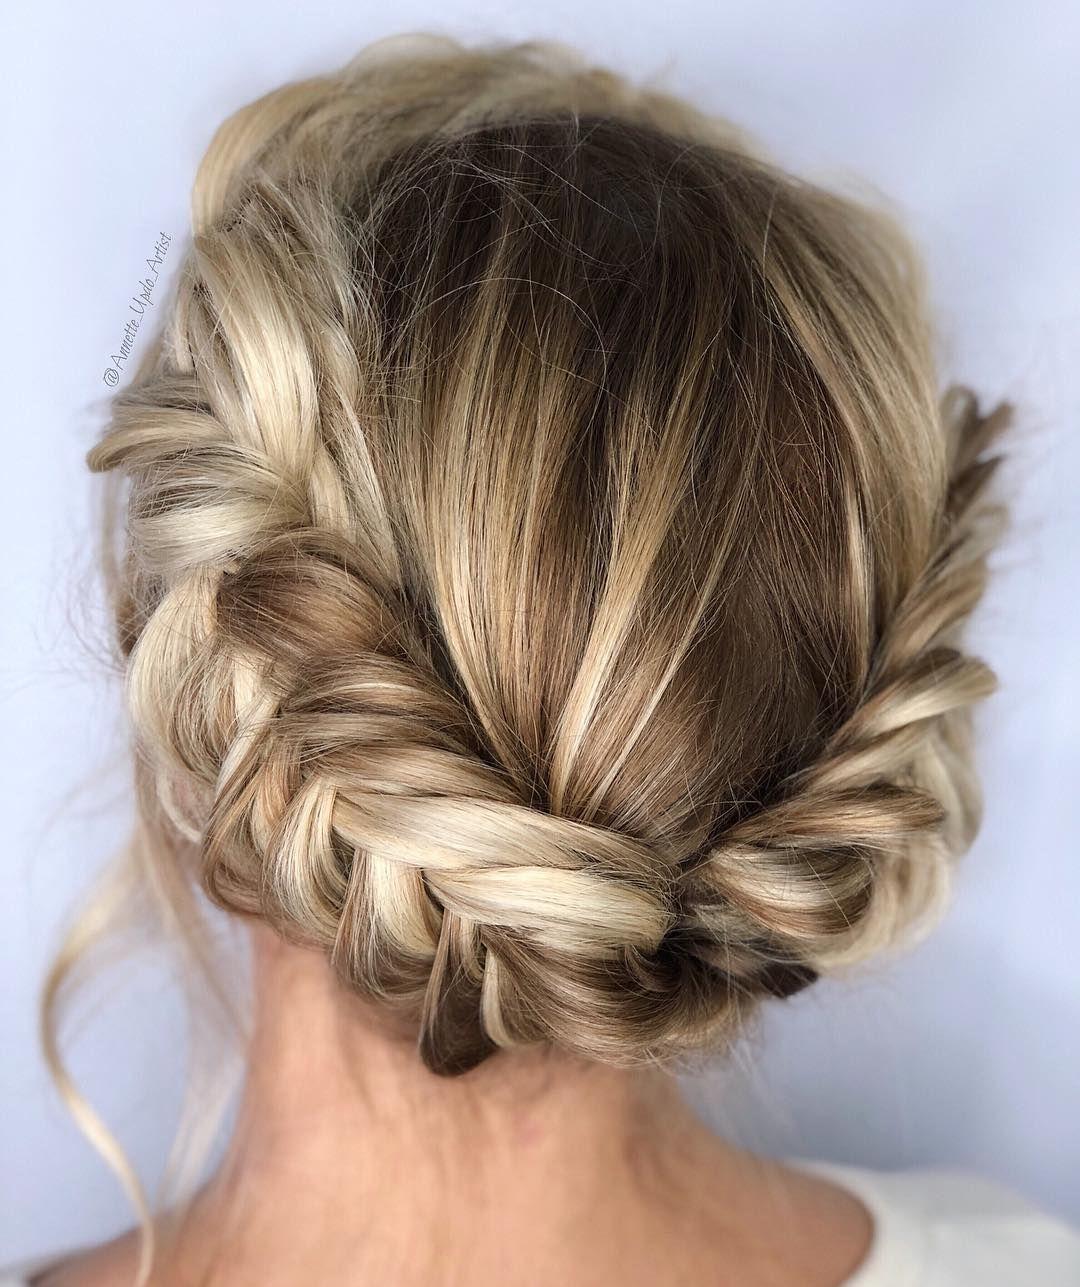 87 Fabulous Wedding Hairstyles For Every Wedding Dress Neckline